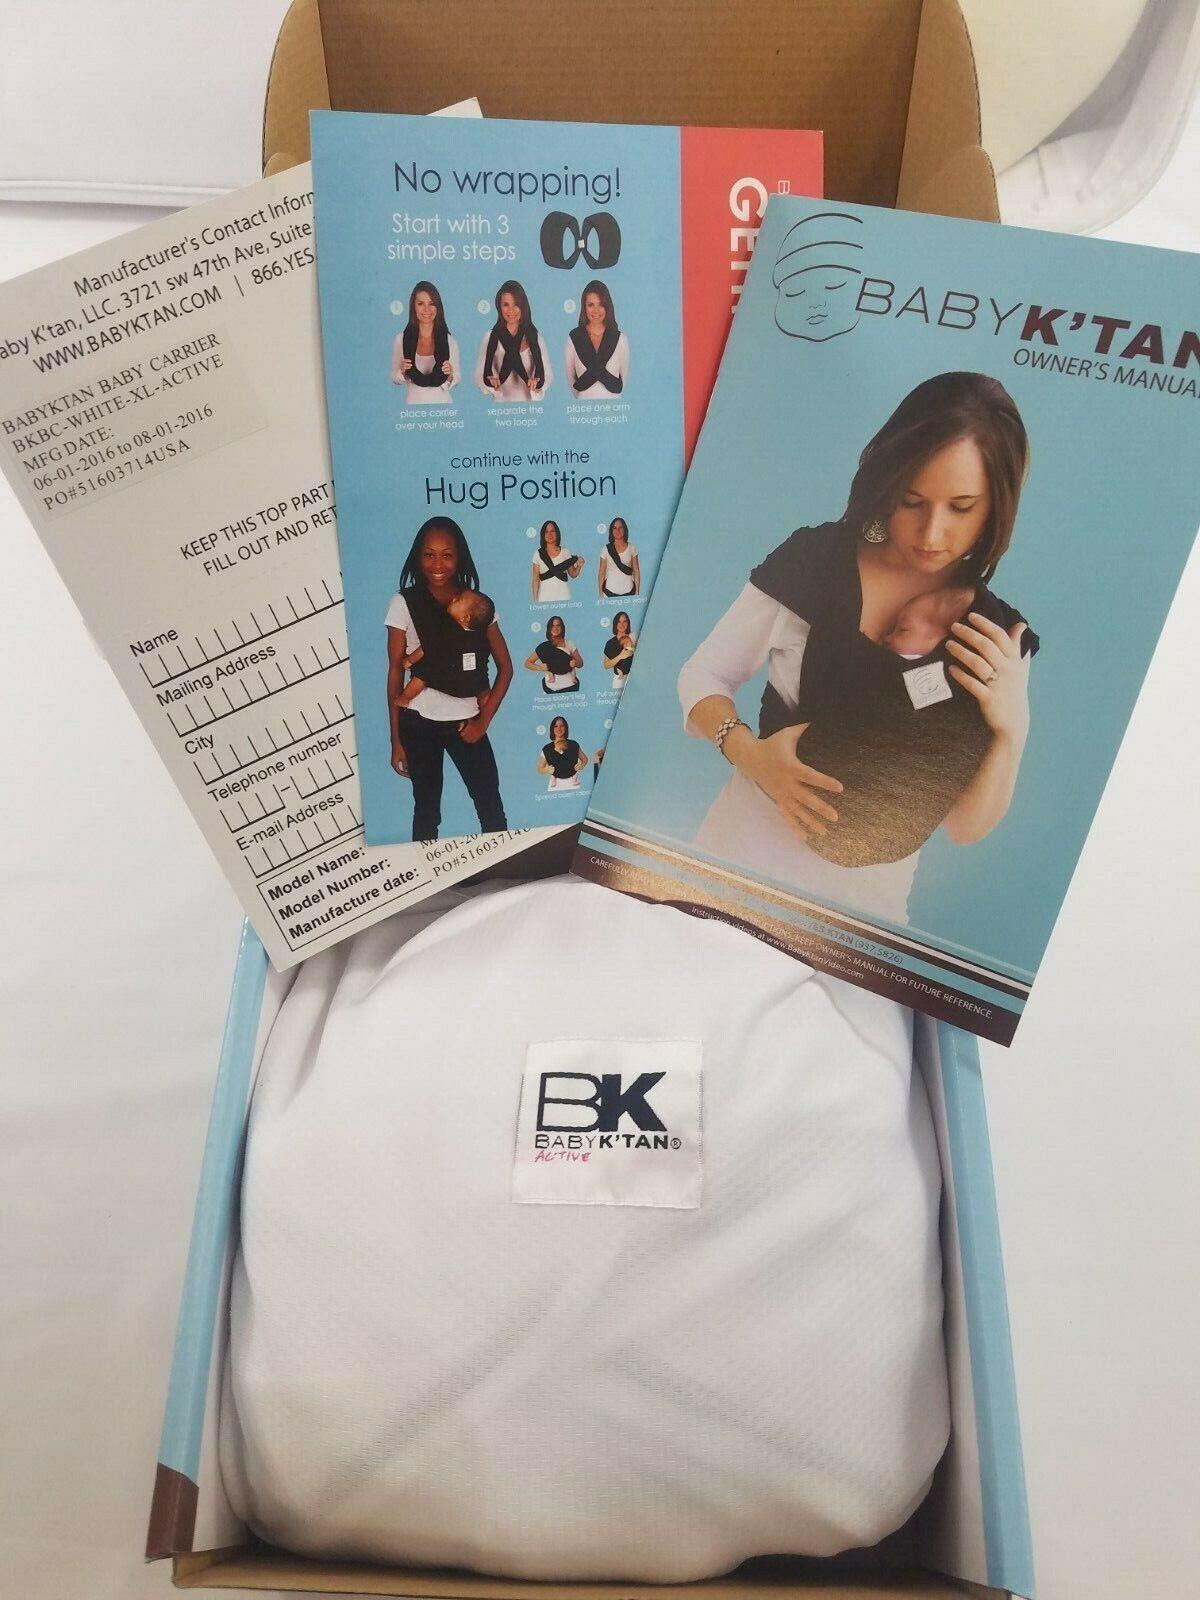 Baby K'tan ORIGINAL,BREEZE,ACTIVE Baby Carrier Black,Teal,Charcoal XXS,S,M,L,XL